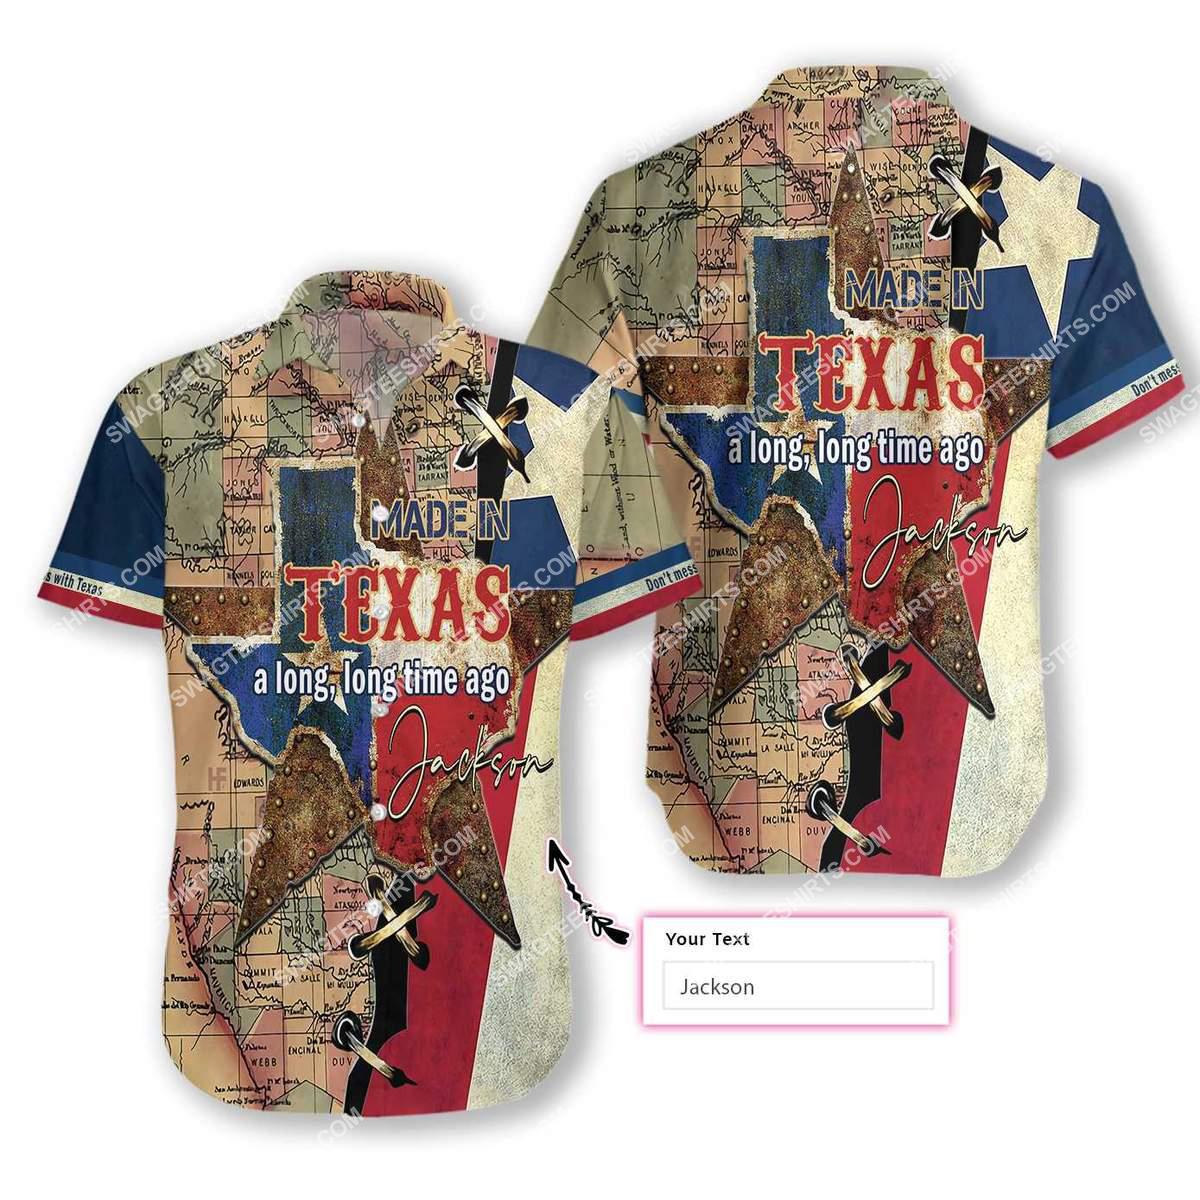 custom name made in texas a long long time ago all over printed hawaiian shirt 1(1)